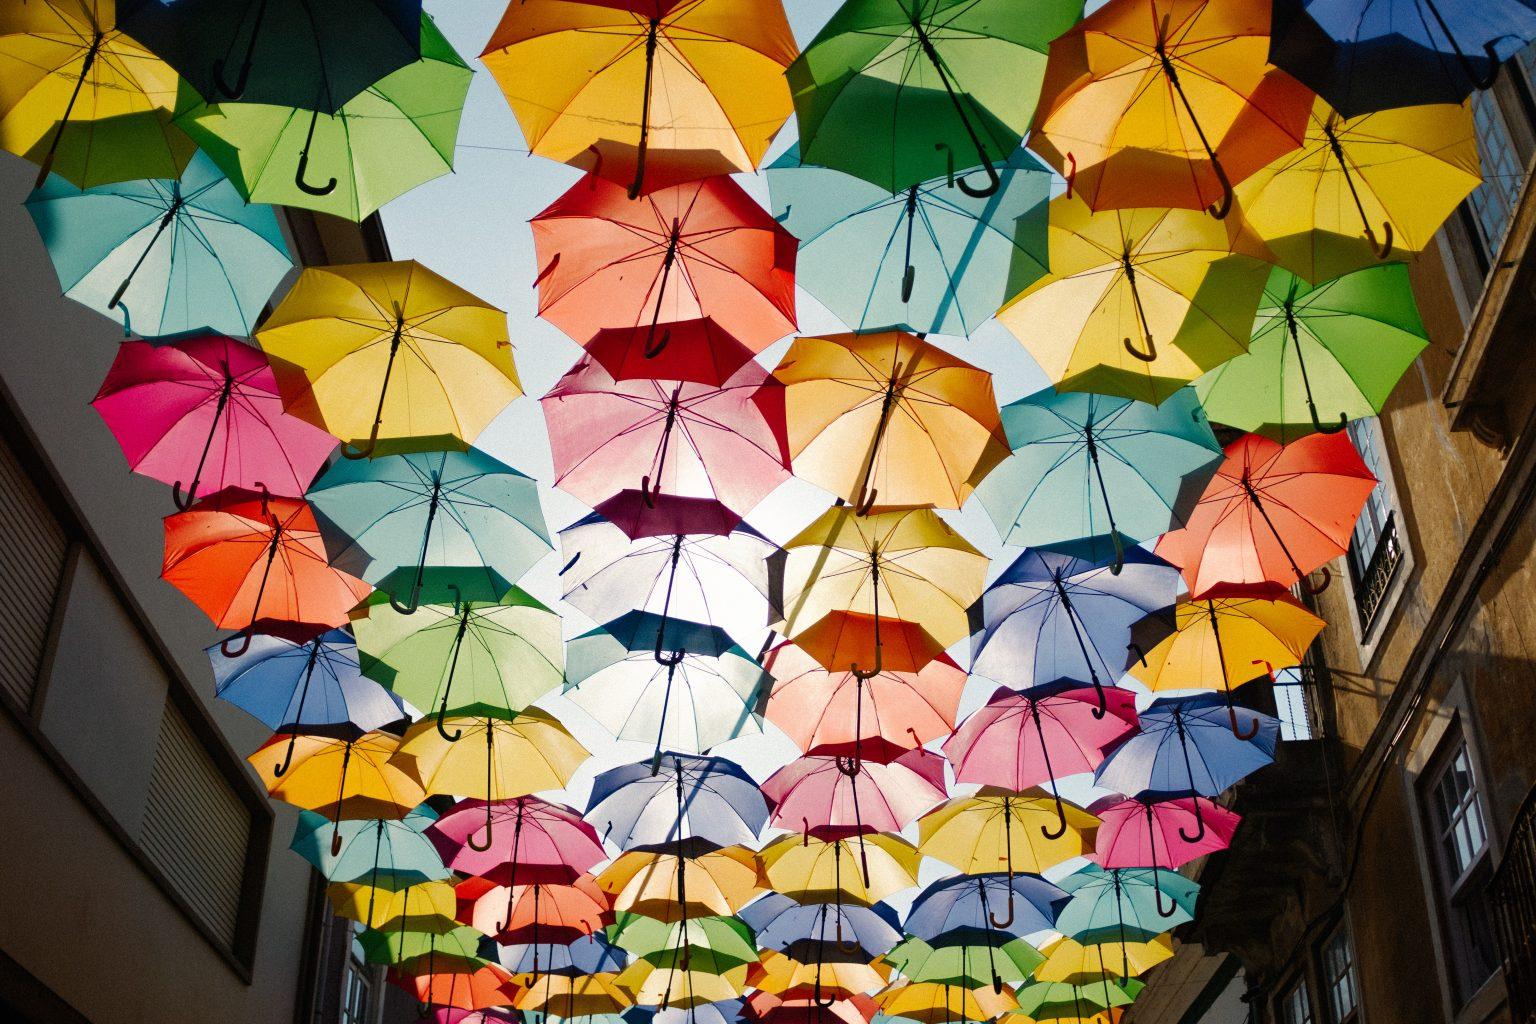 Umbrellas - Tailored Tech - Protection